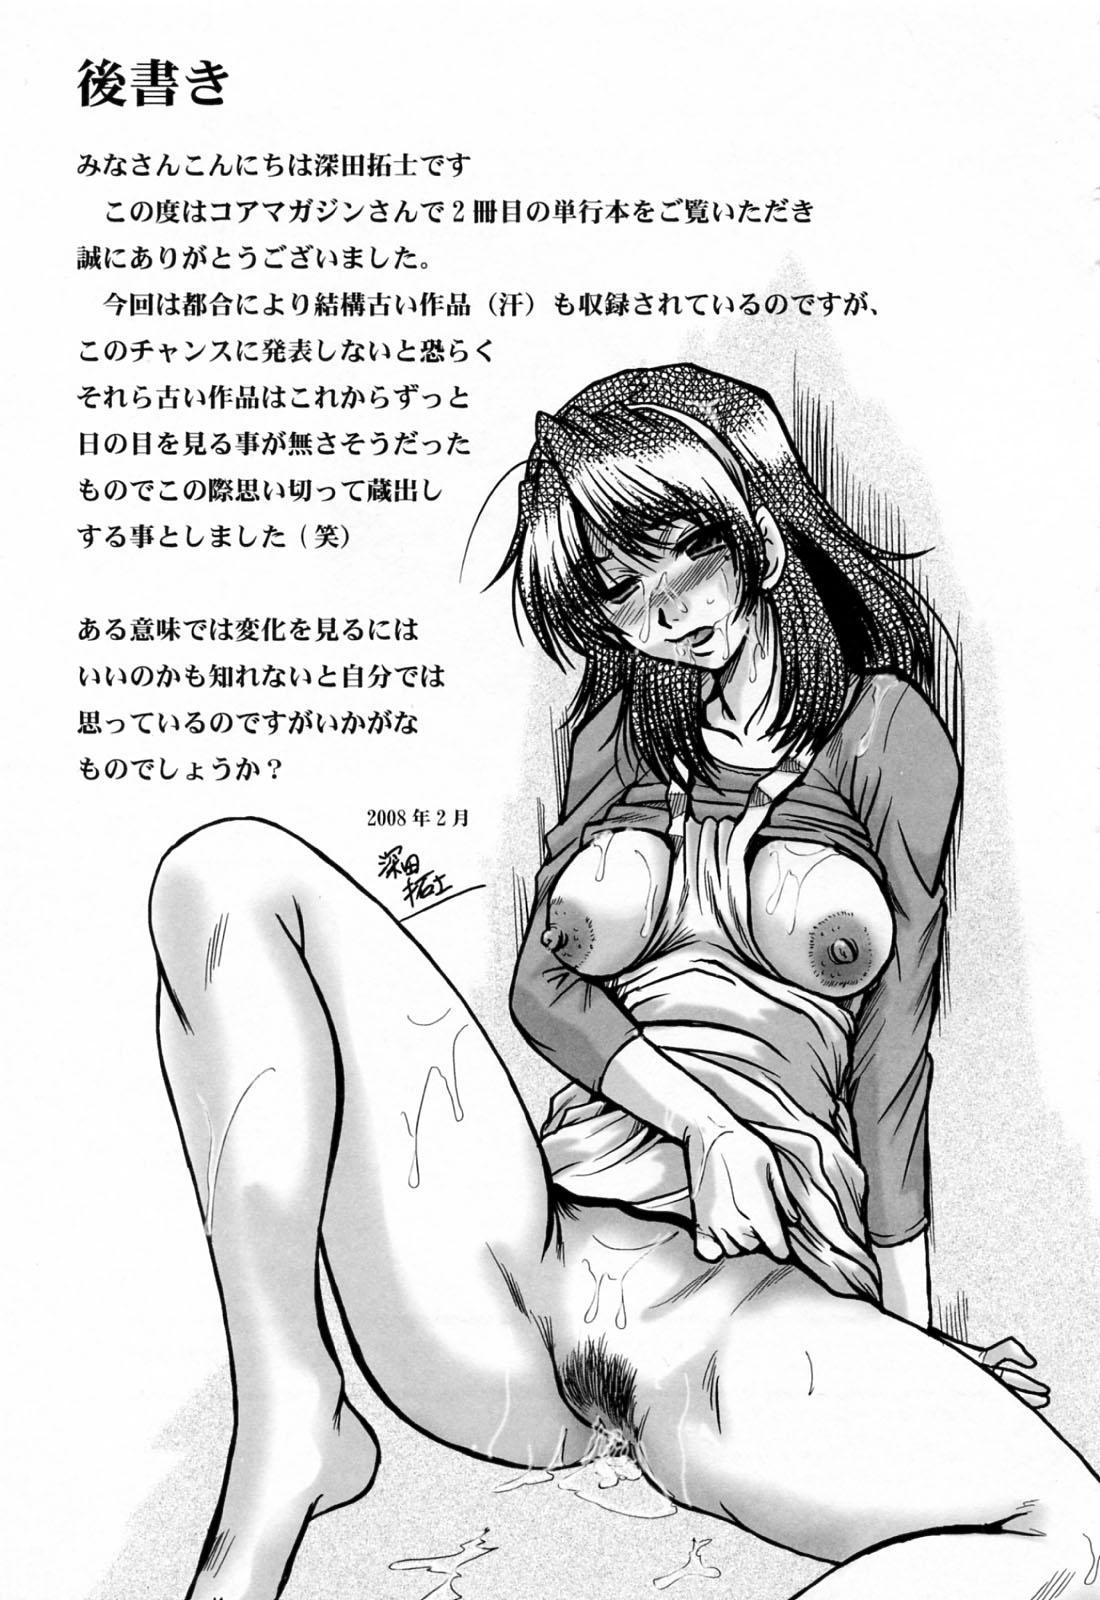 Kanjuku Hitozuma Nikki - The diary of the mature married woman 192